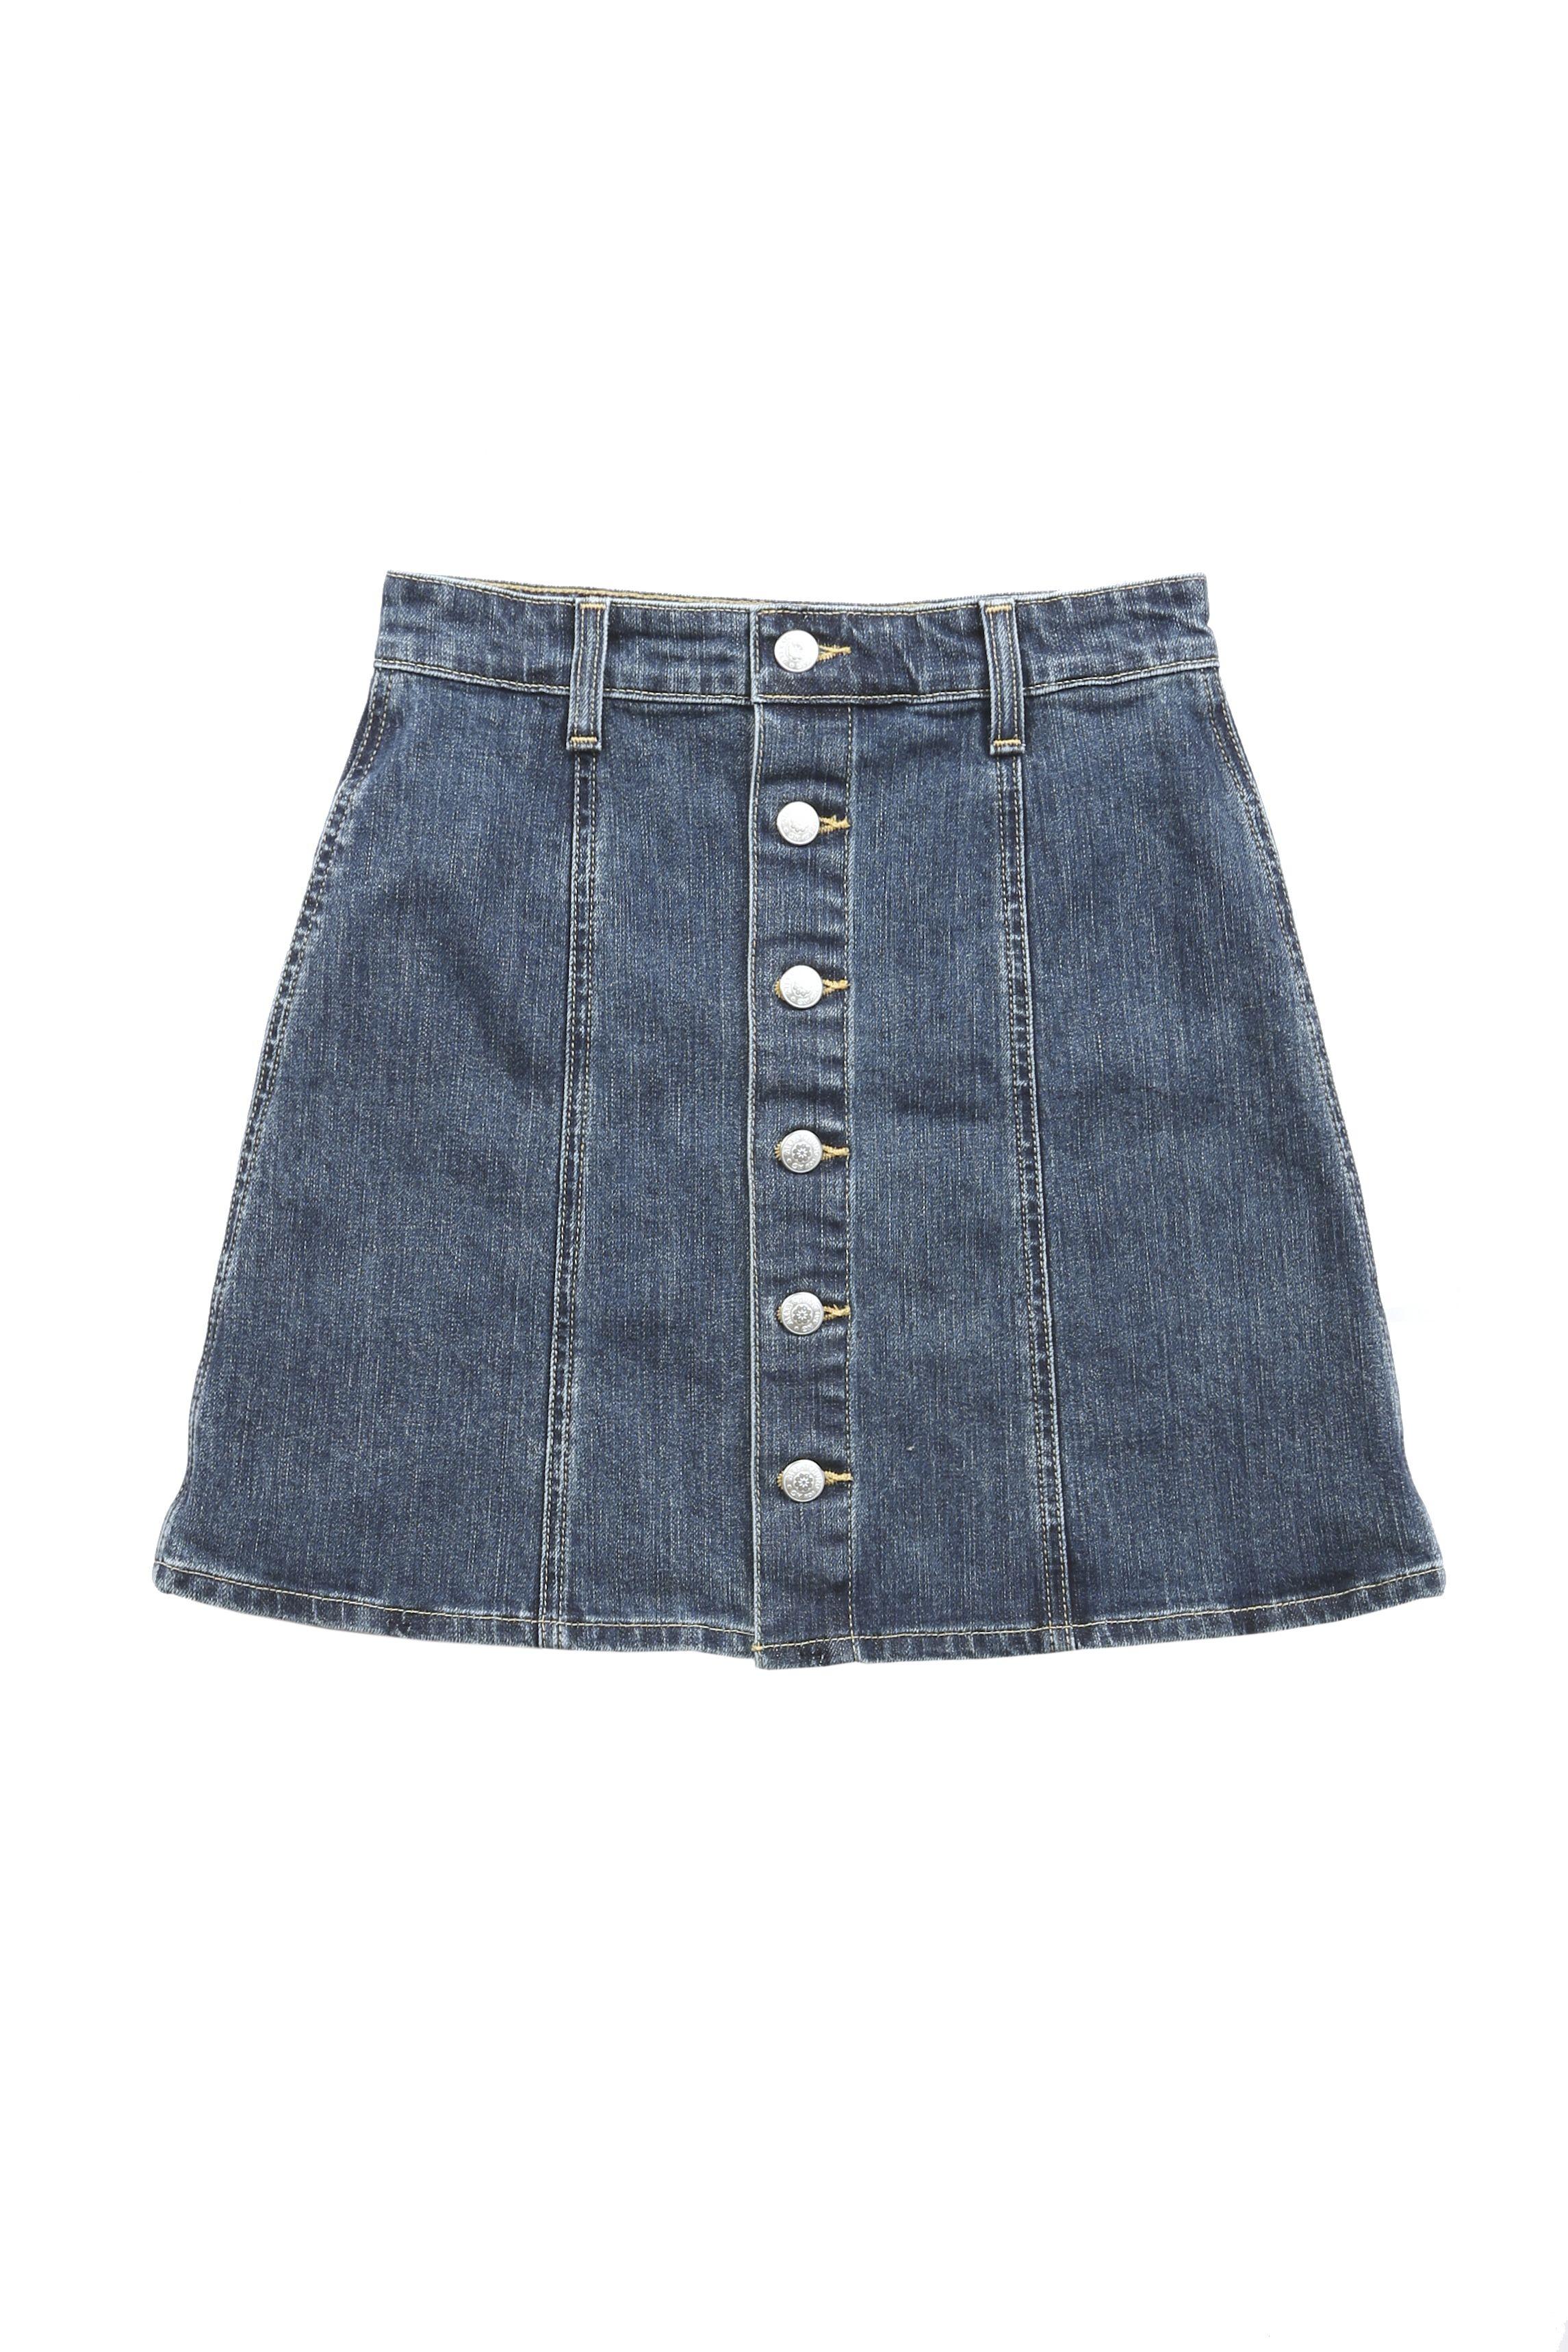 "<p>Kety Denim Skirt, $245; <a href=""http://www.stylebop.com/product_details.php?menu1=designer&menu2=&menu3=4068&id=613063"">stylebop.com</a></p>"